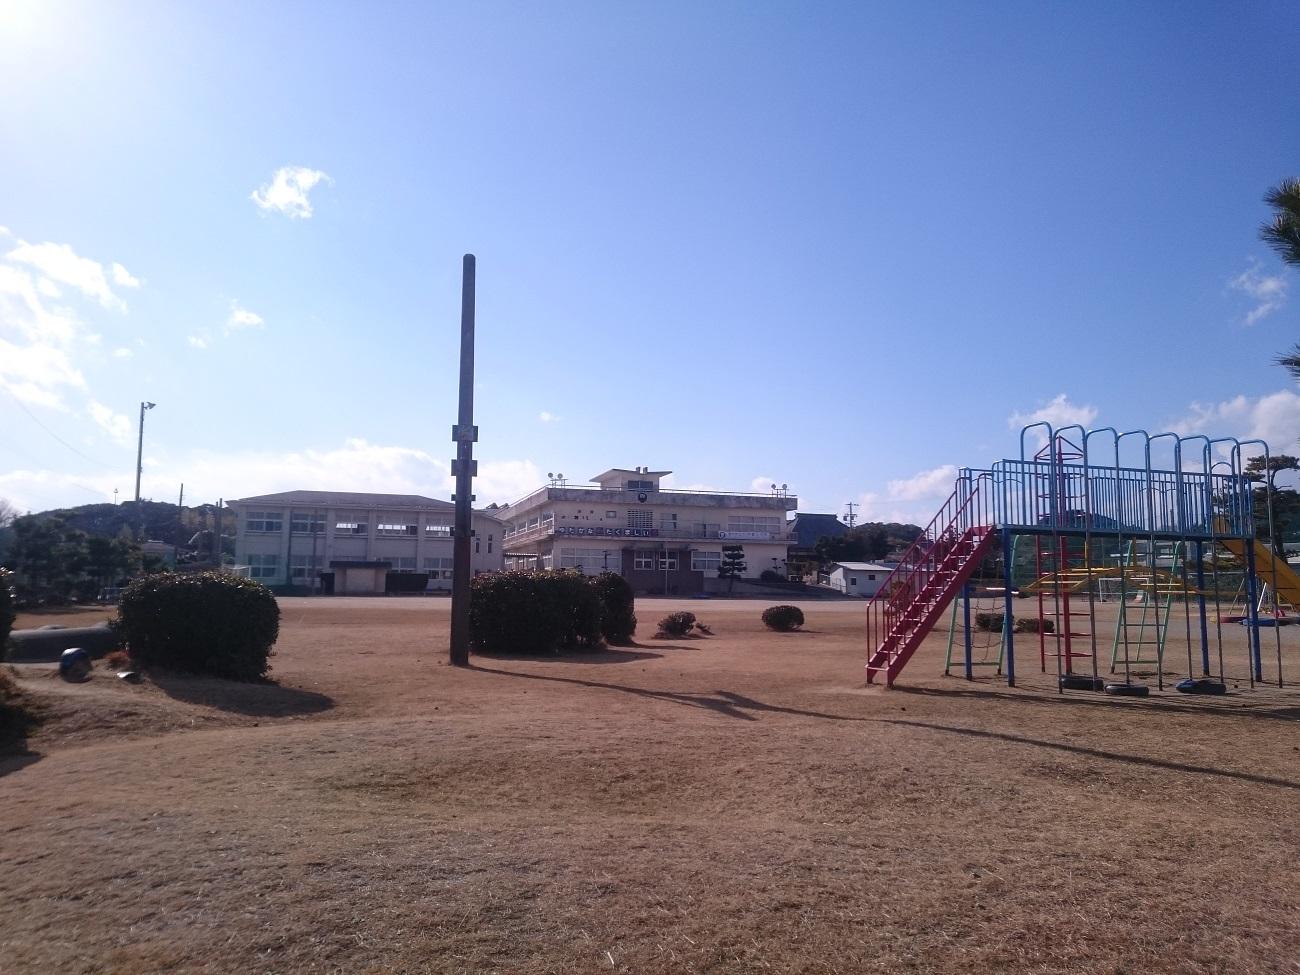 記事志摩市立甲賀小学校 閉校のイメージ画像